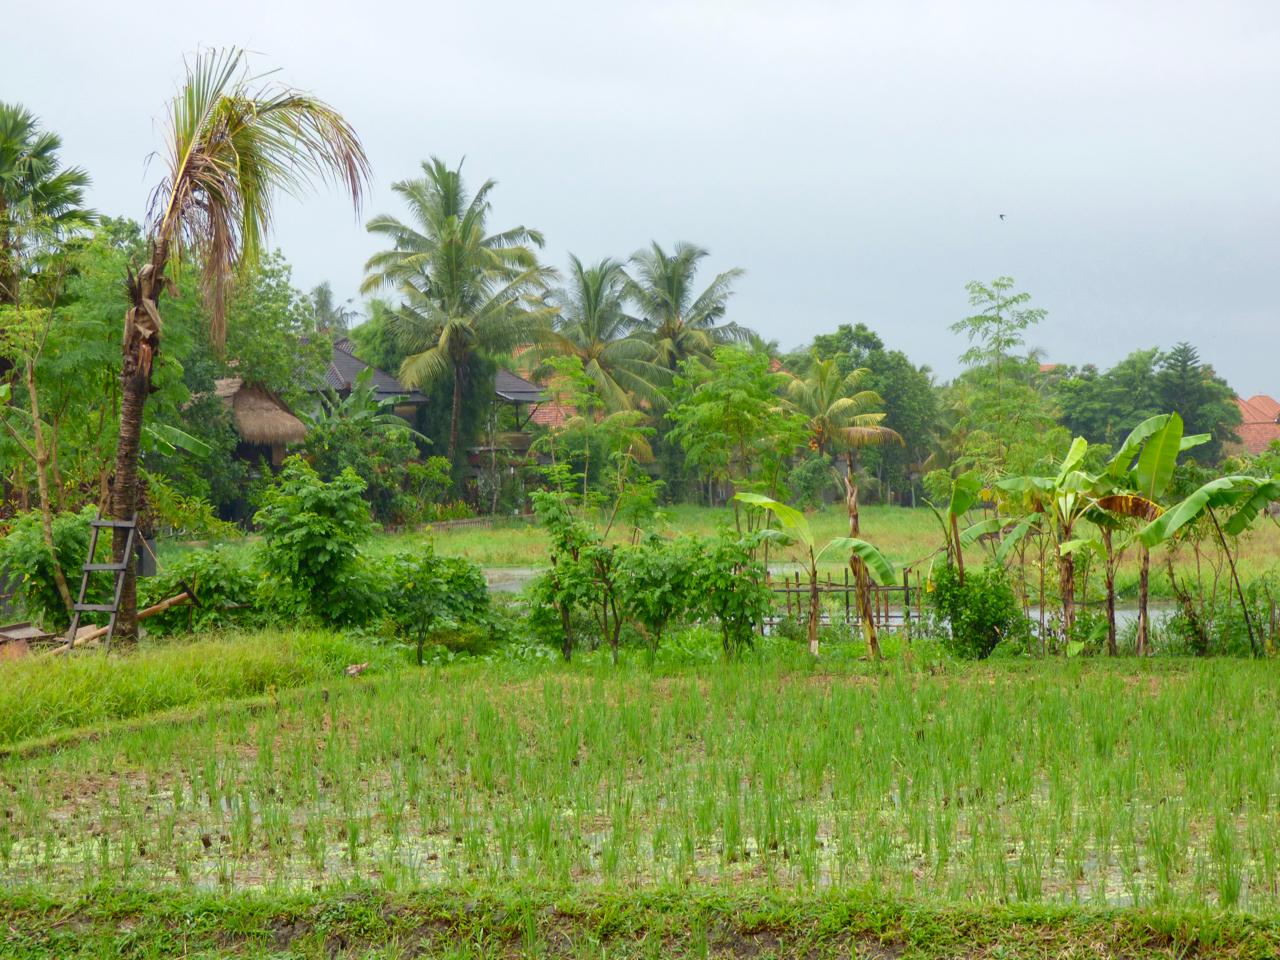 Rice paddy in Ubud, Indonesia